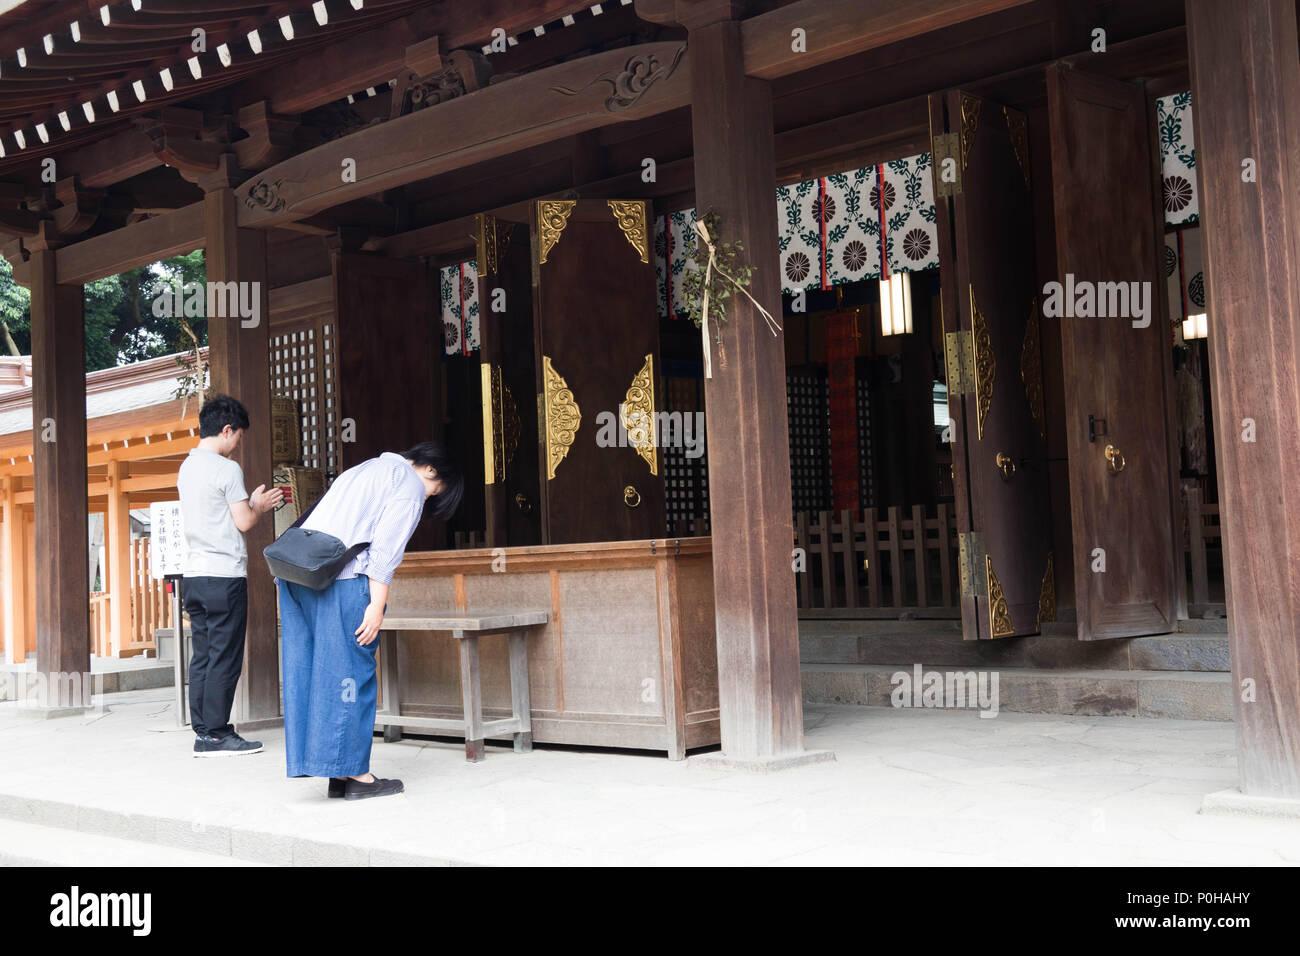 Worshipper bowing in prayer at Hikawa Jinja shrine, Omiya, Saitama, Japan - Stock Image